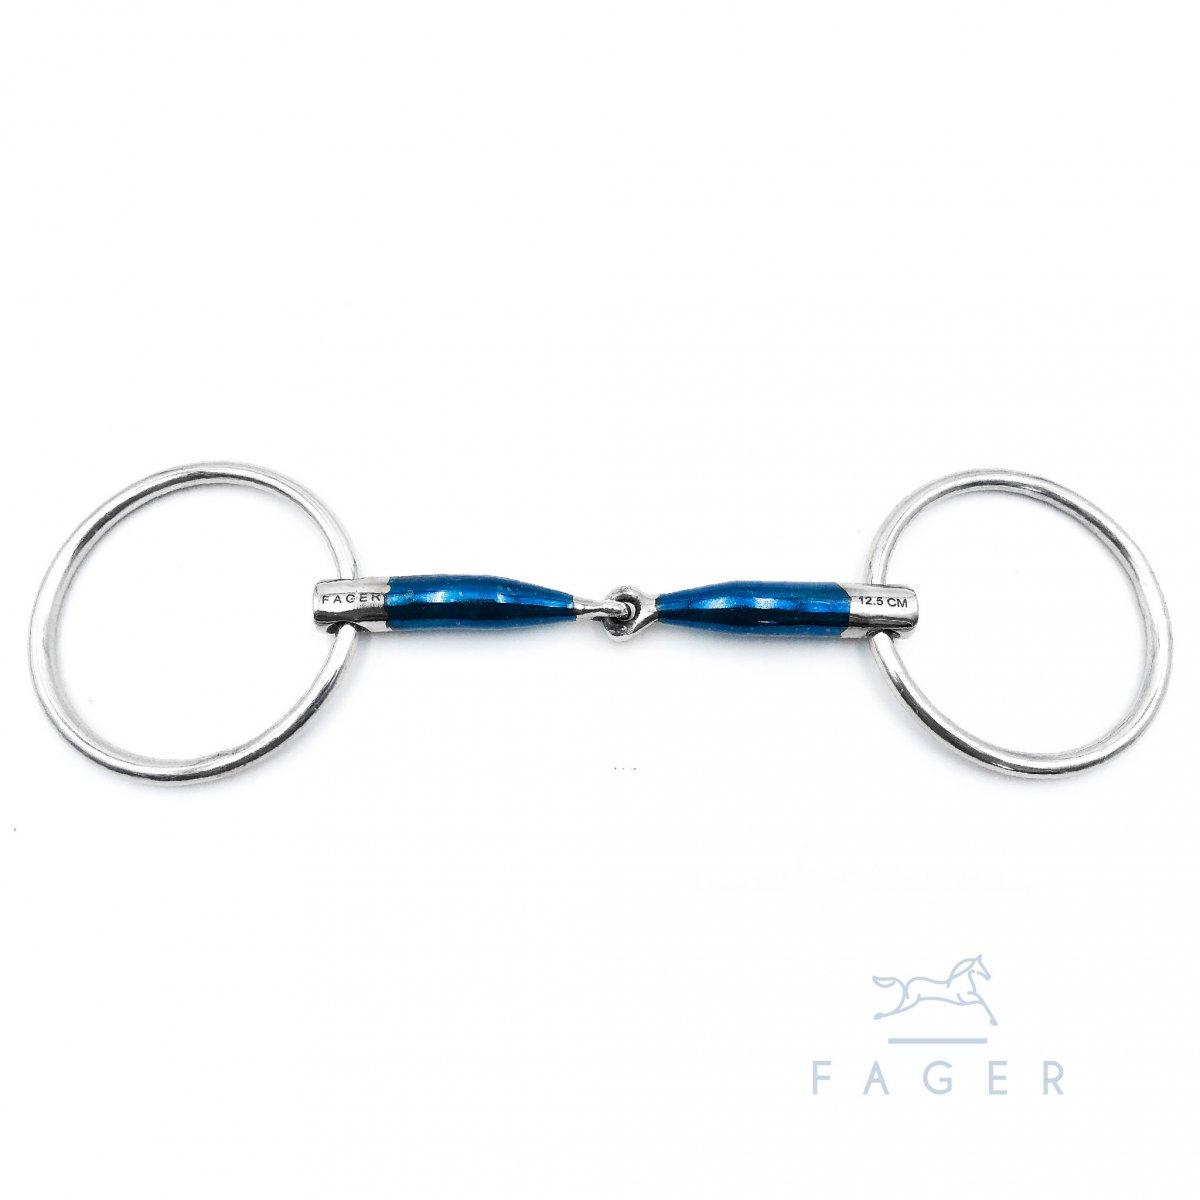 fagers-smart-lock-fss-loose-rings-bit-anna